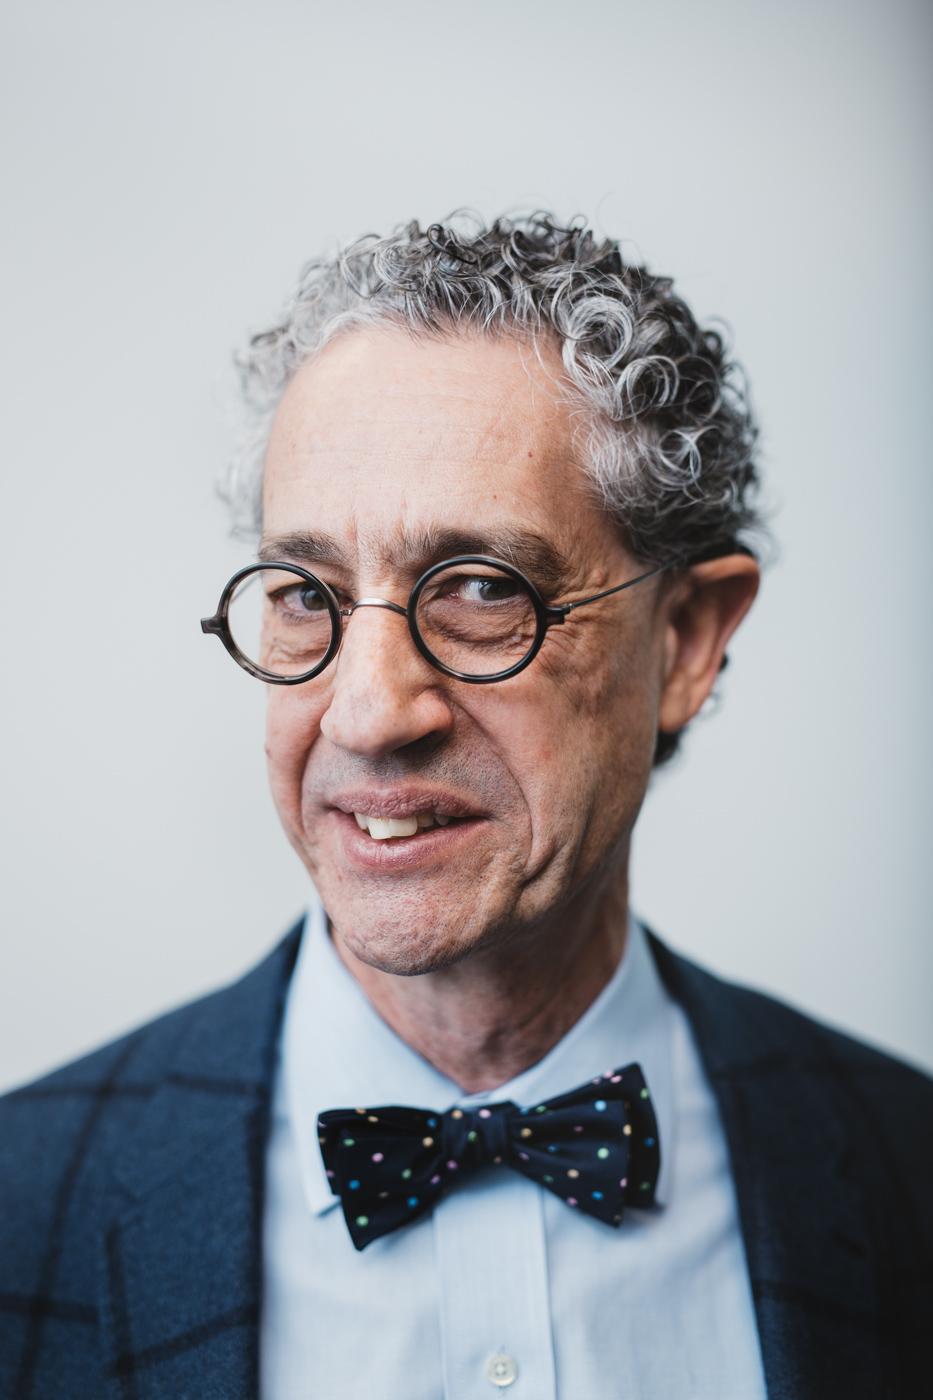 Portrait of Economist Peter Tertzakian on editorial assignment in Calgary